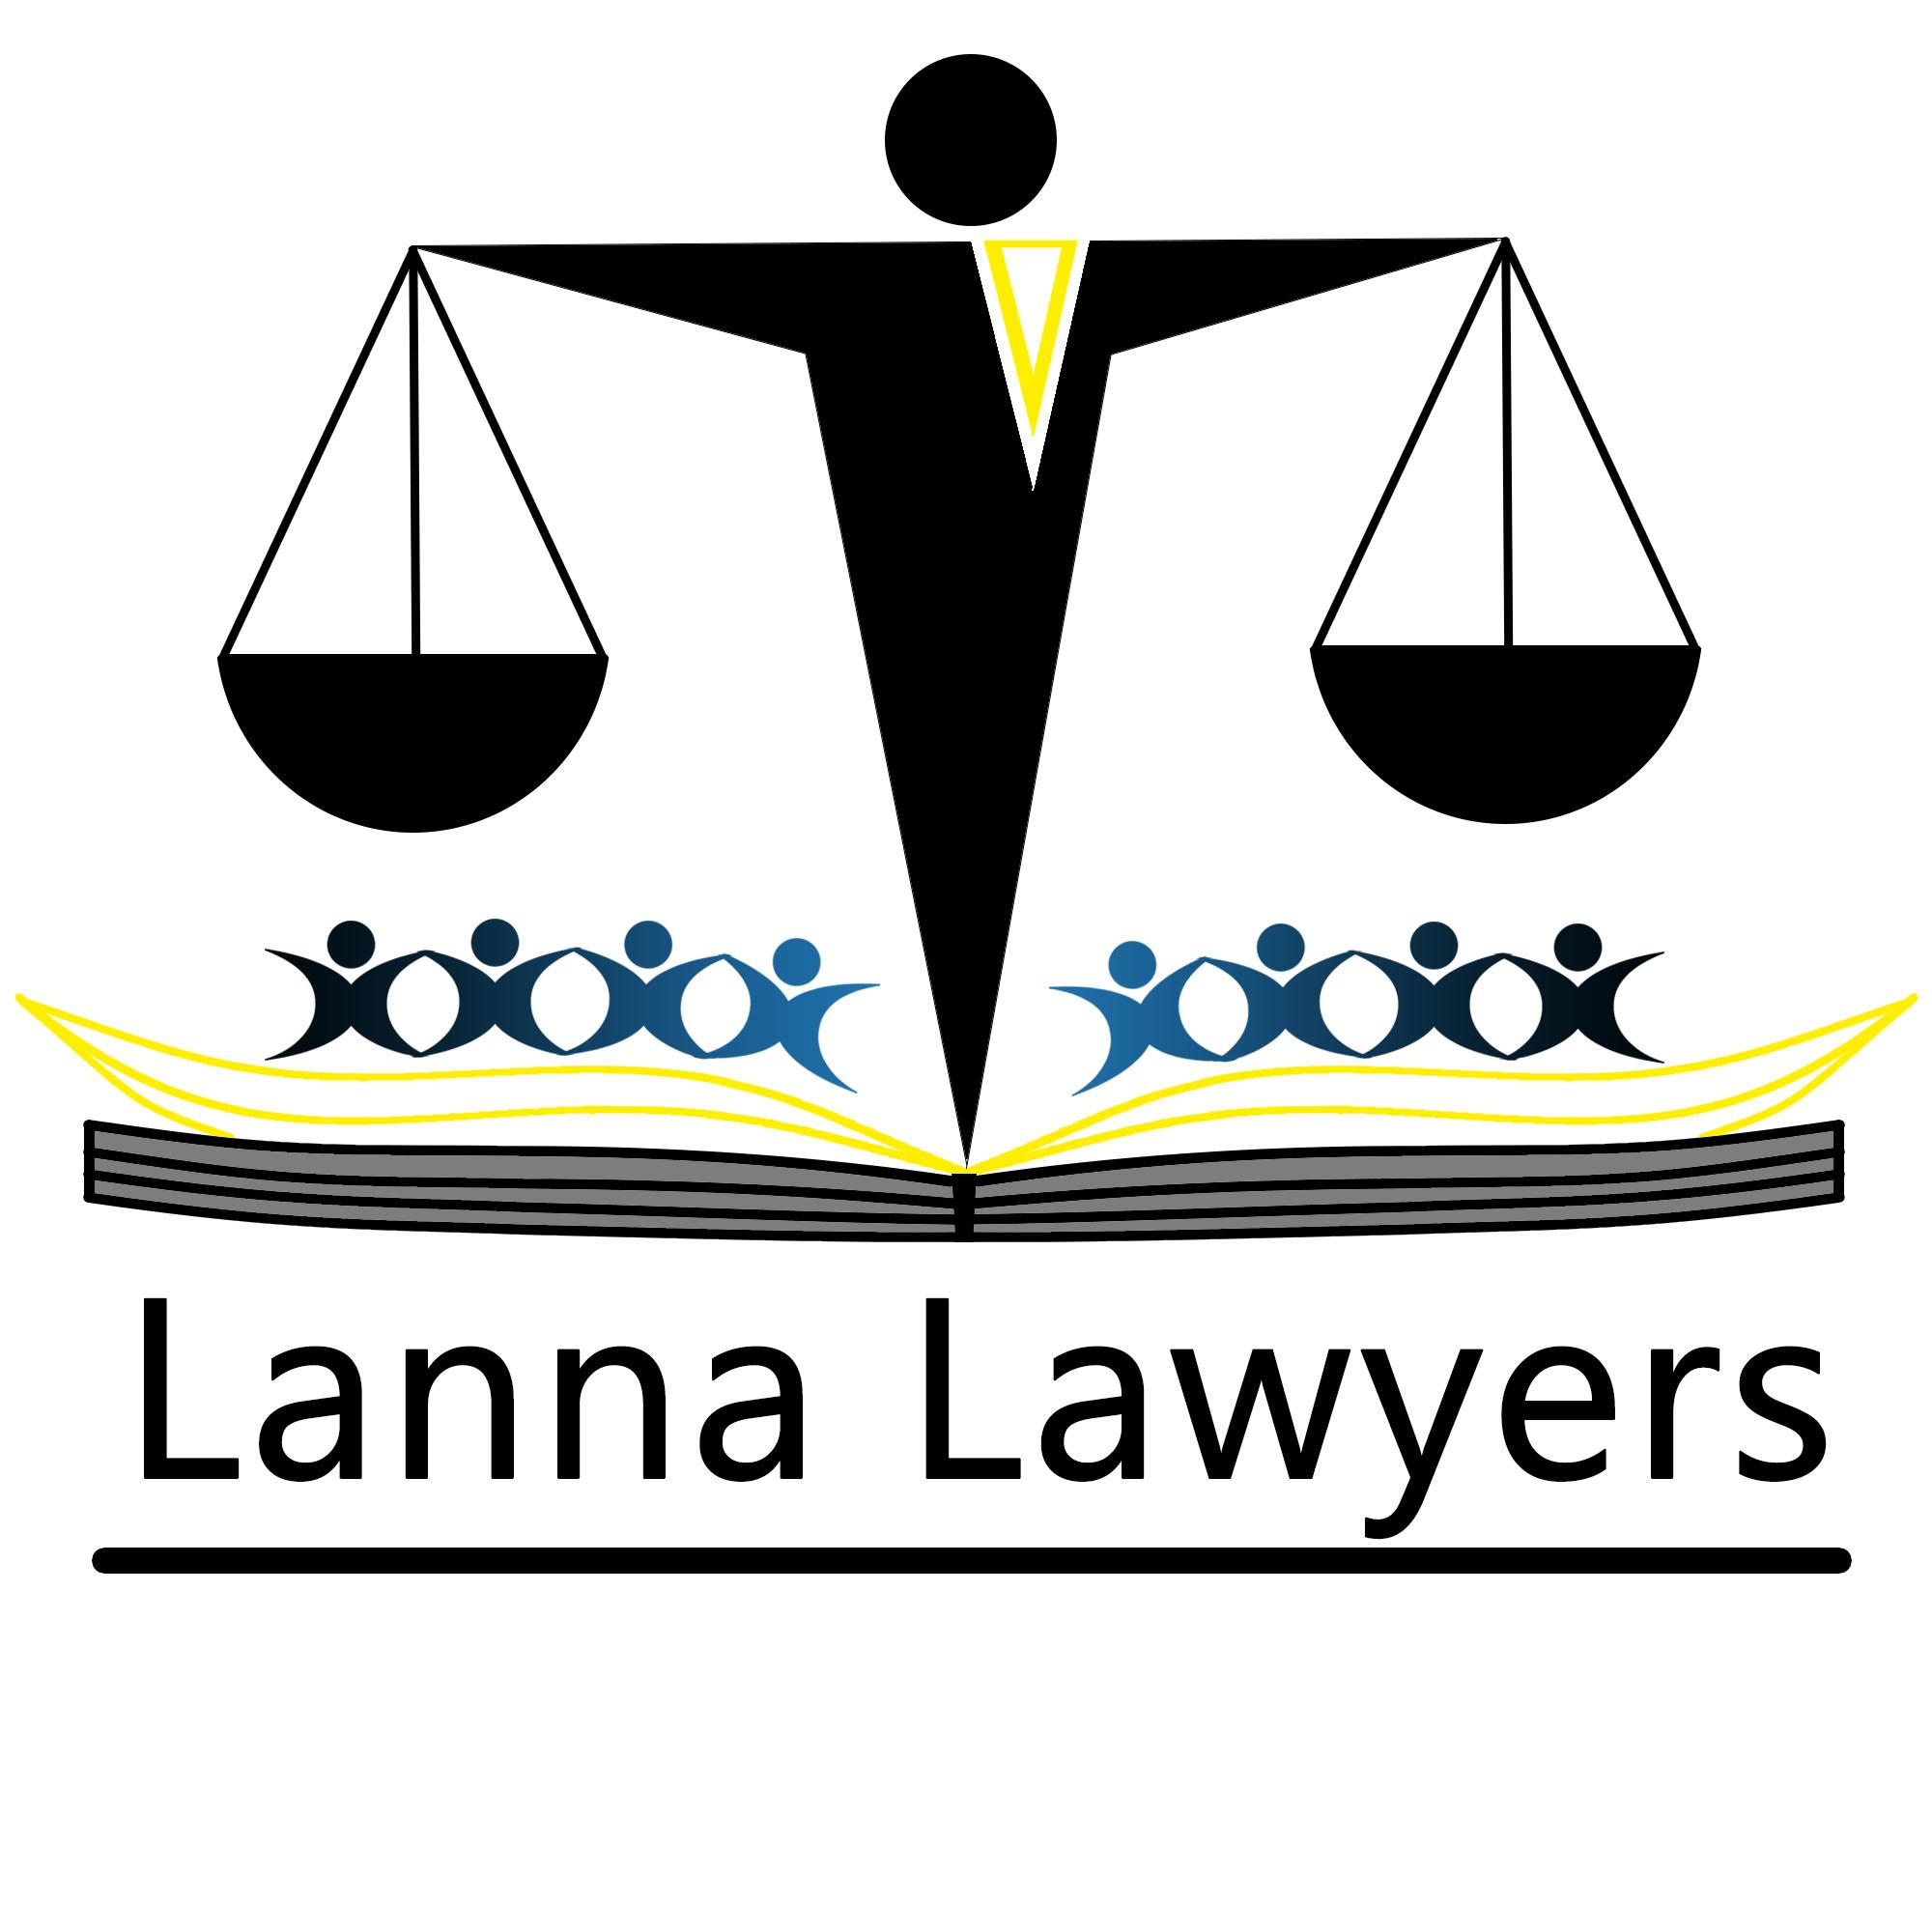 Lanna Lawyers_High Quality Logo